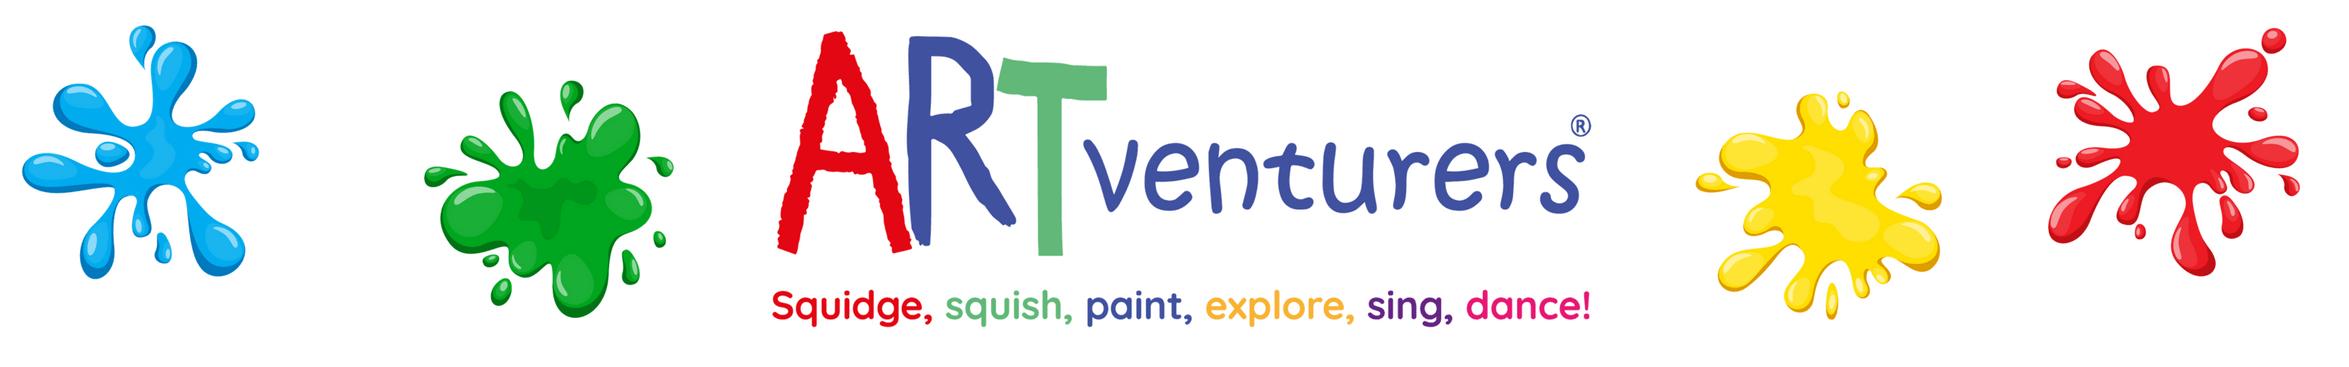 ARTventurers Renfrewshire